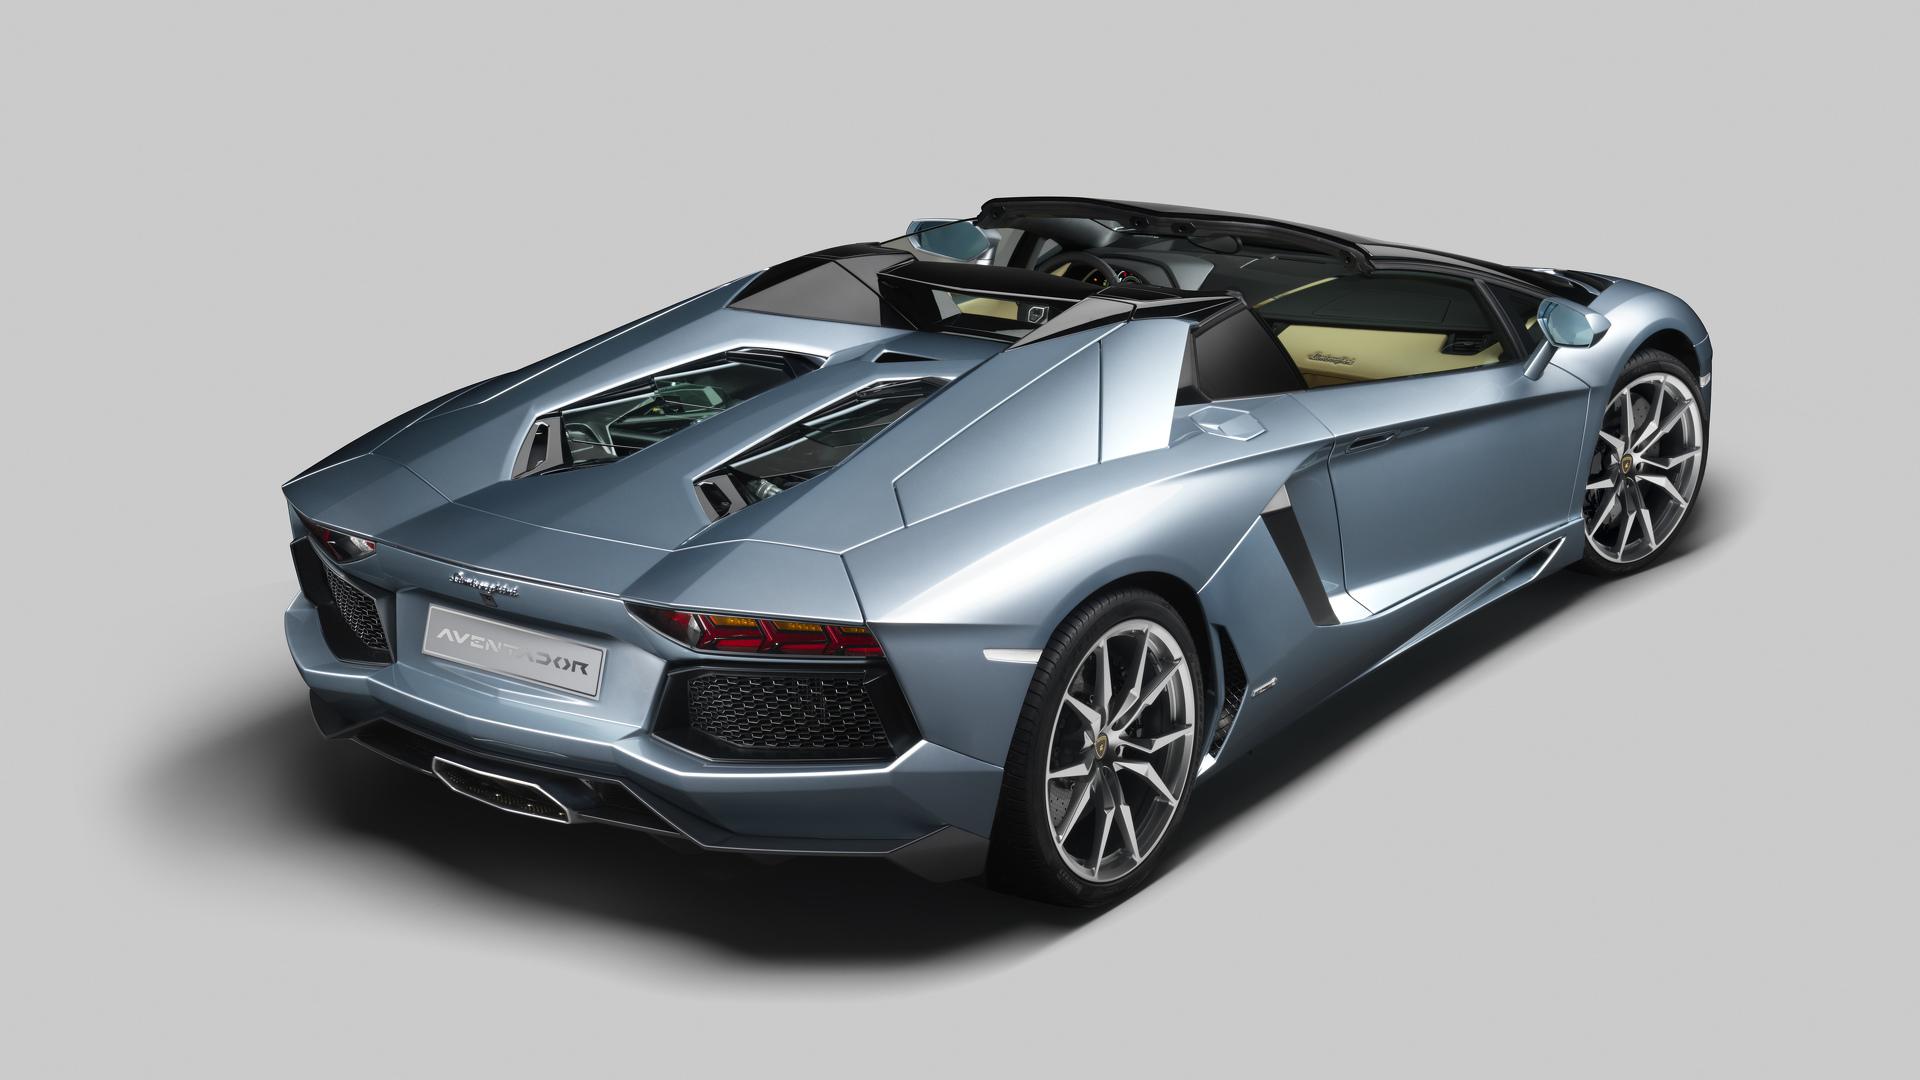 Buy Lamborghini Aventador >> Lamborghini Aventador LP 700-4 Roadster News and Reviews   Motor1.com